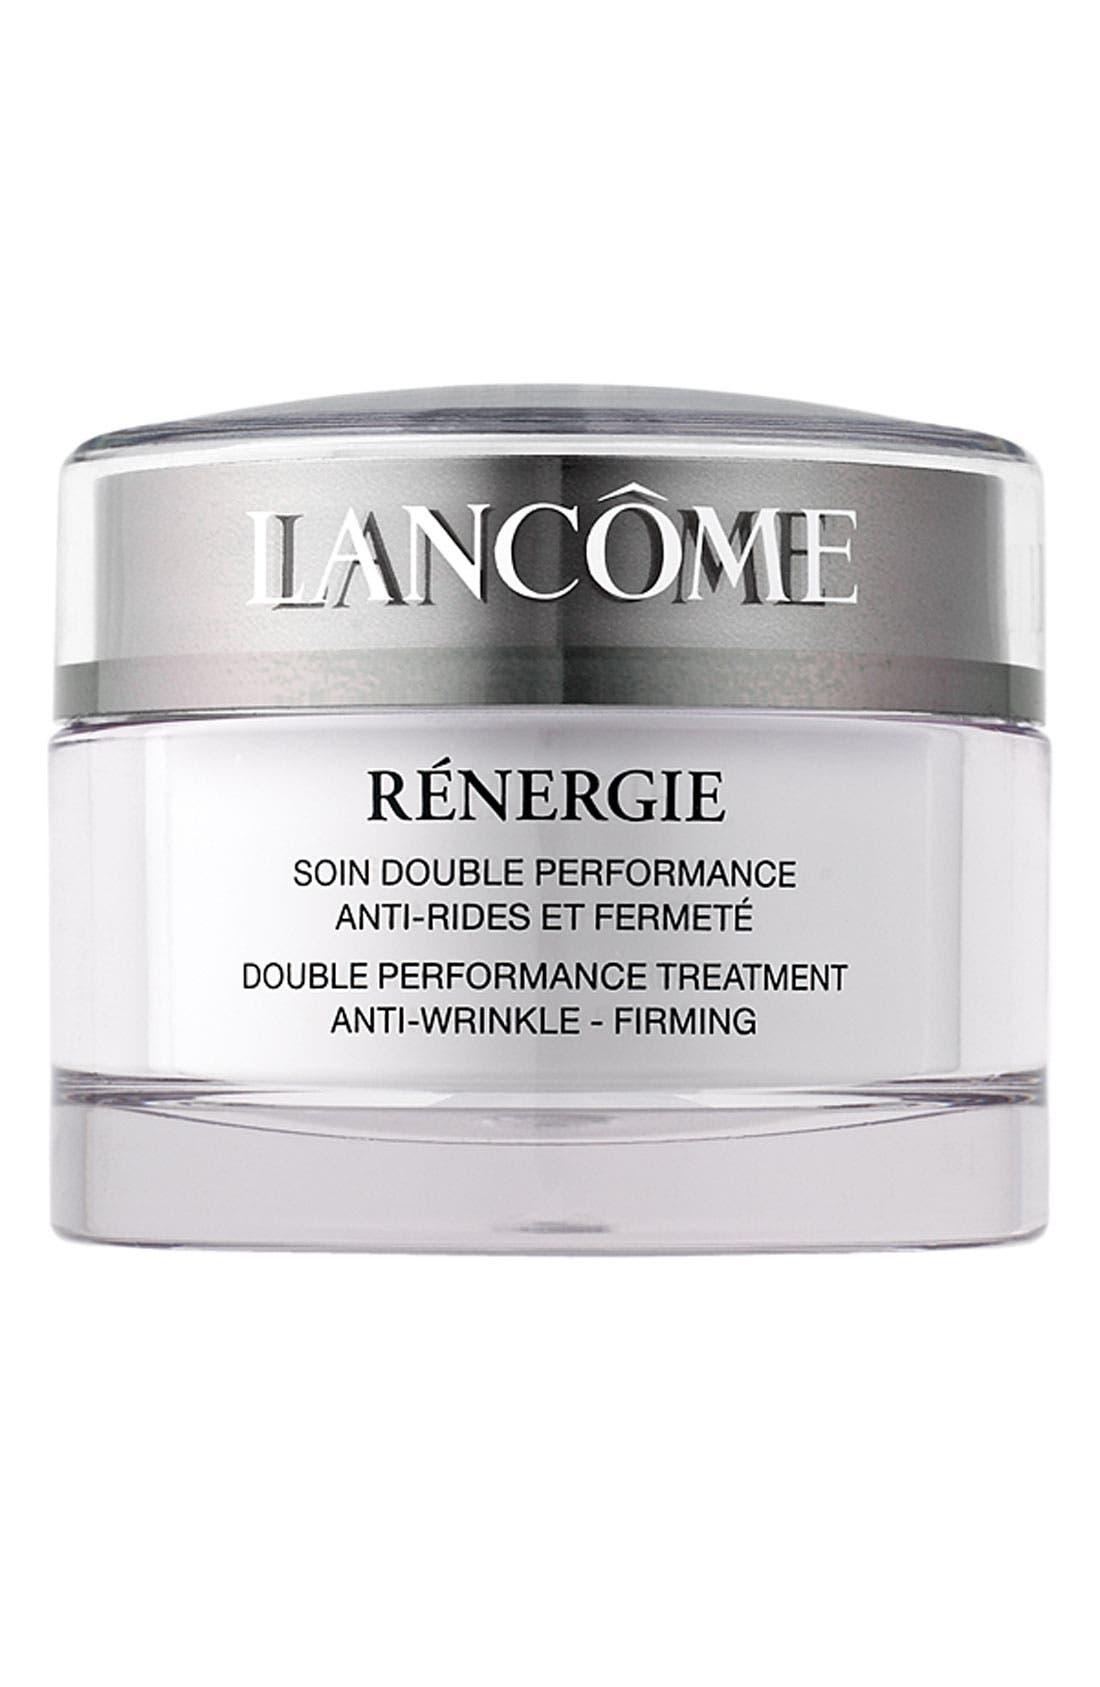 Lancome Renergie Moisturizer Cream oz